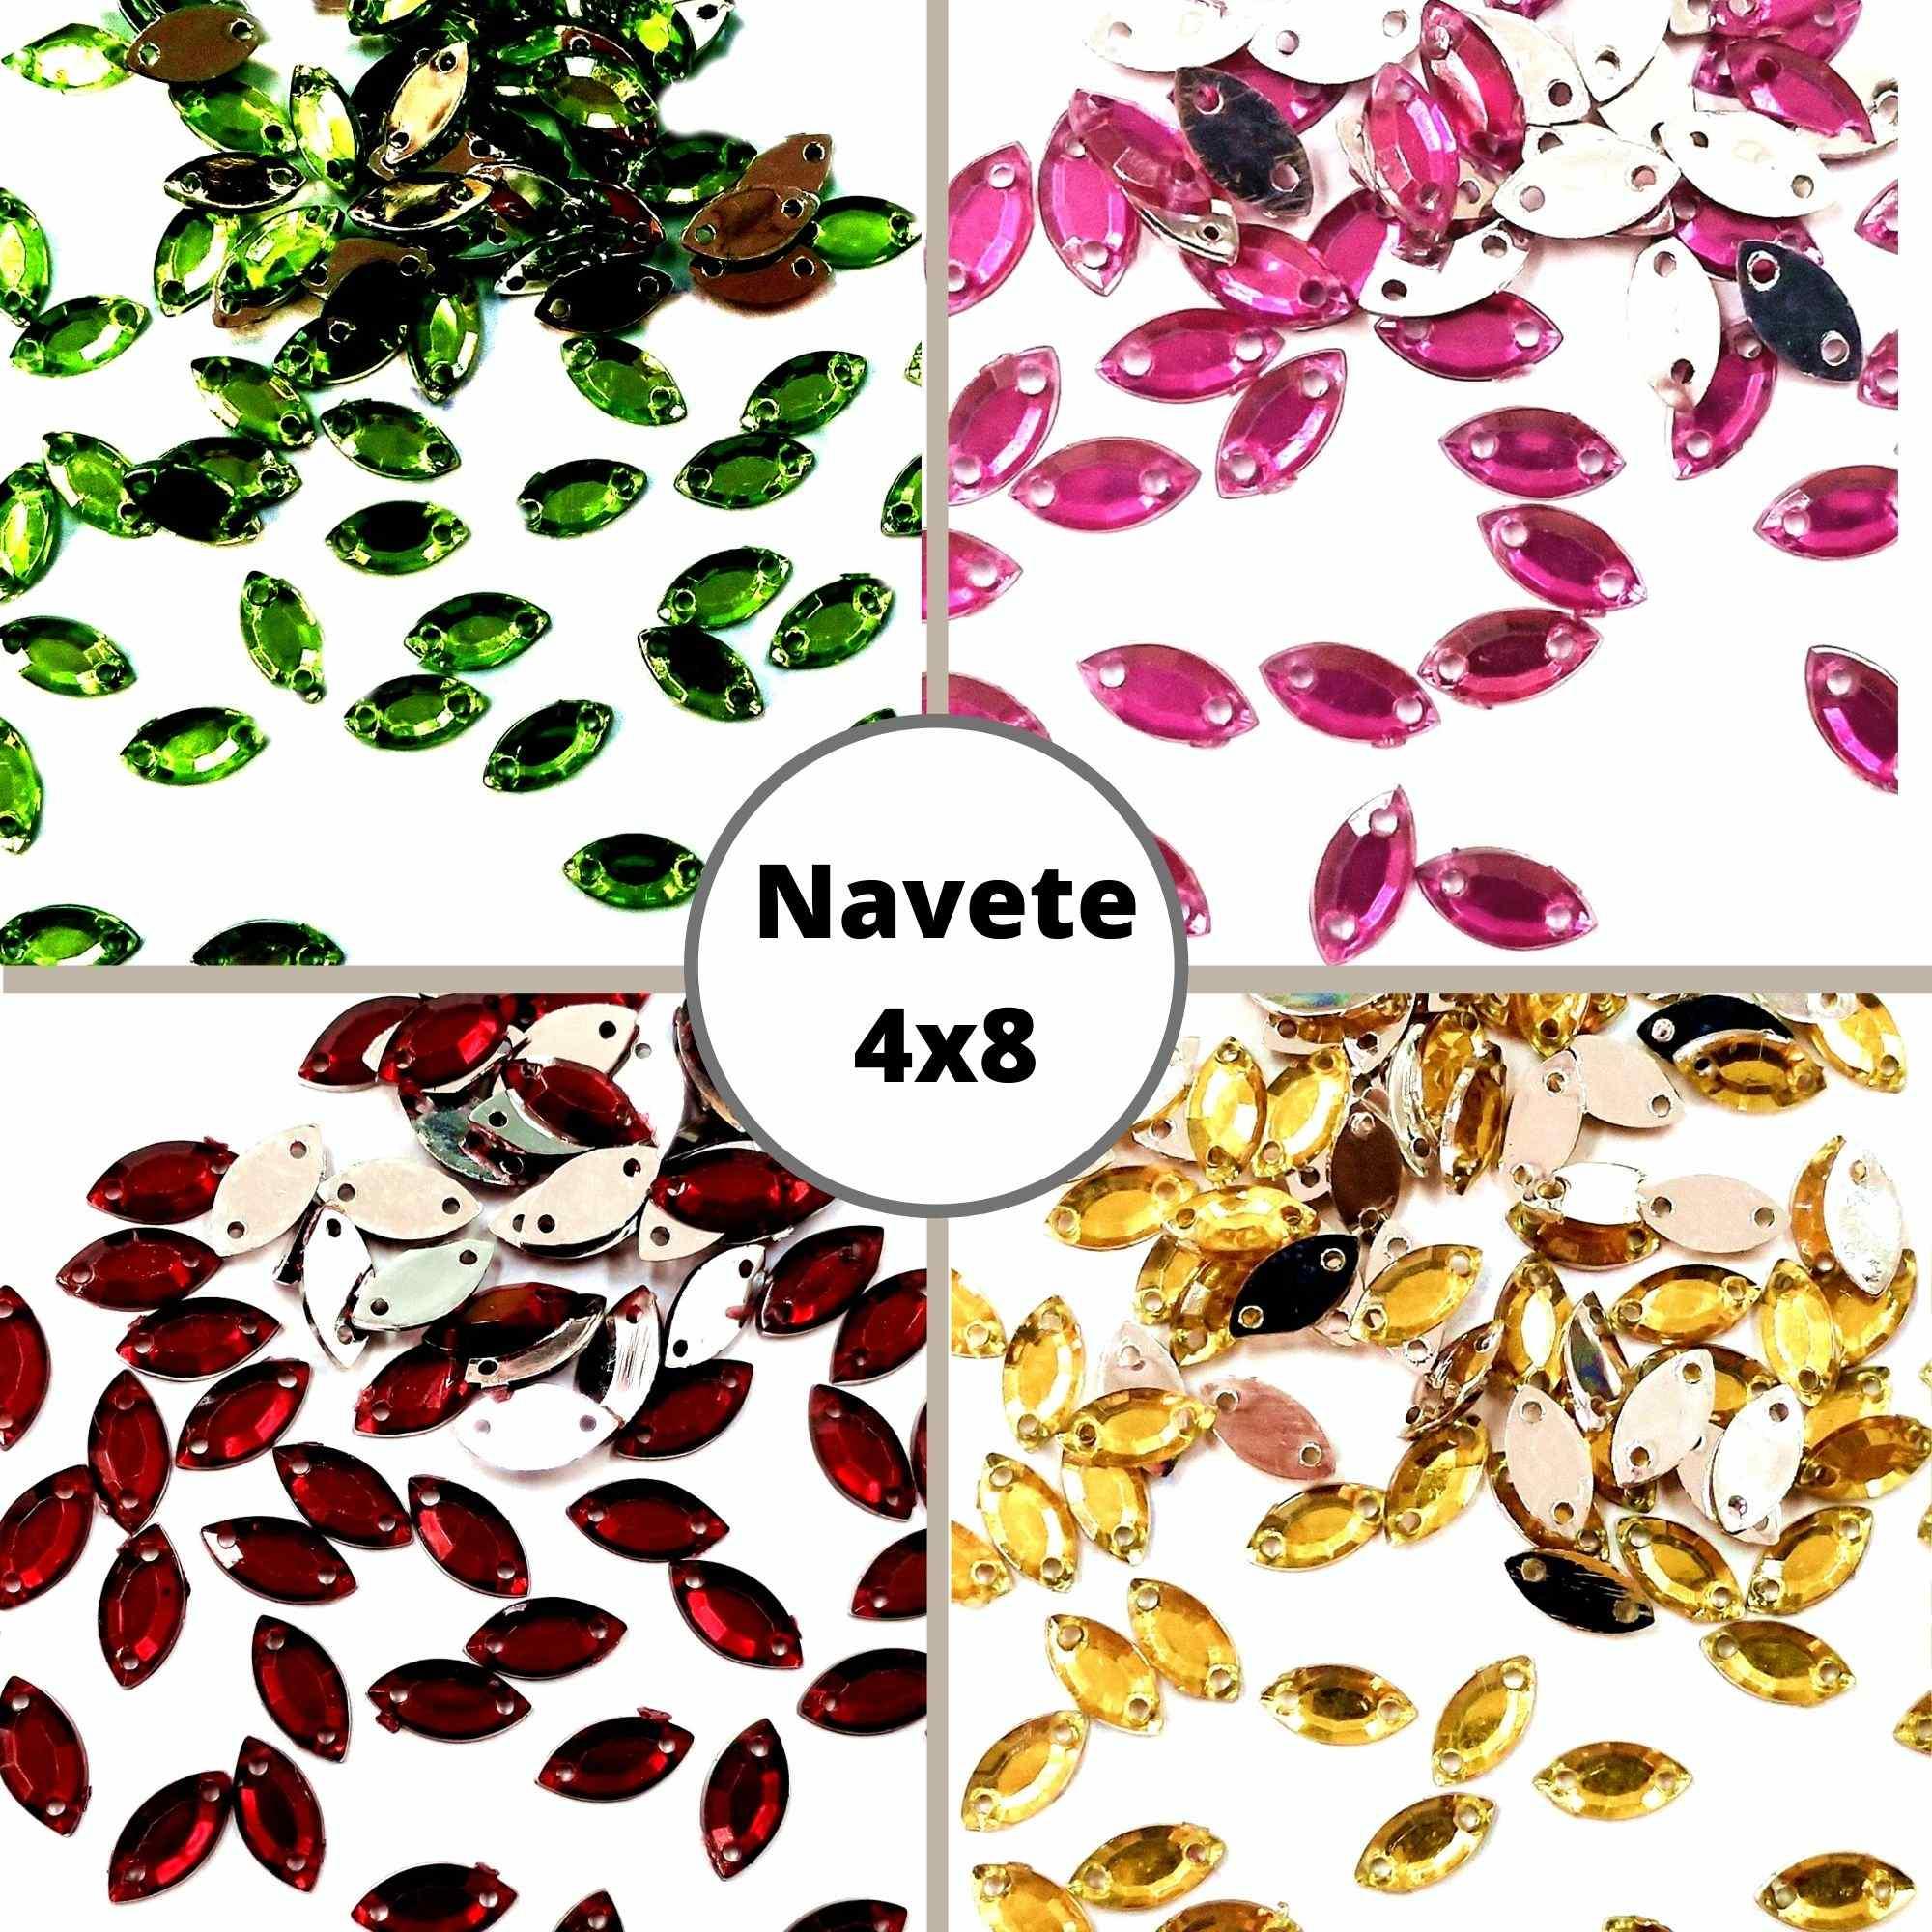 Chaton Navete 4X8 - Pacote com 200 unidades